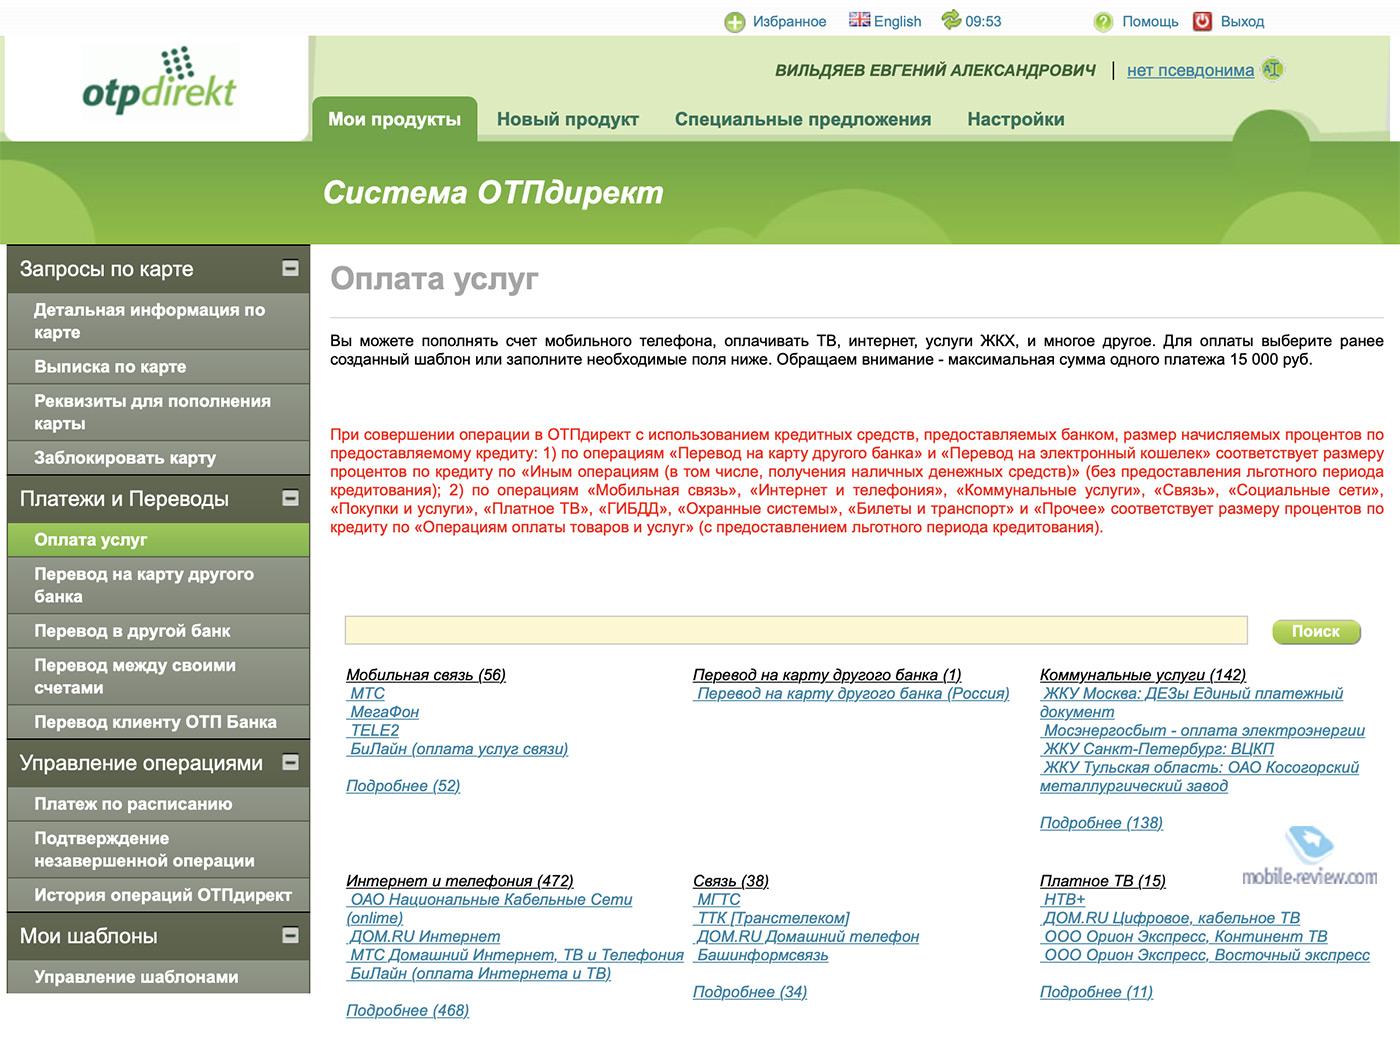 Отп банк оплата кредита онлайн картой сбербанка